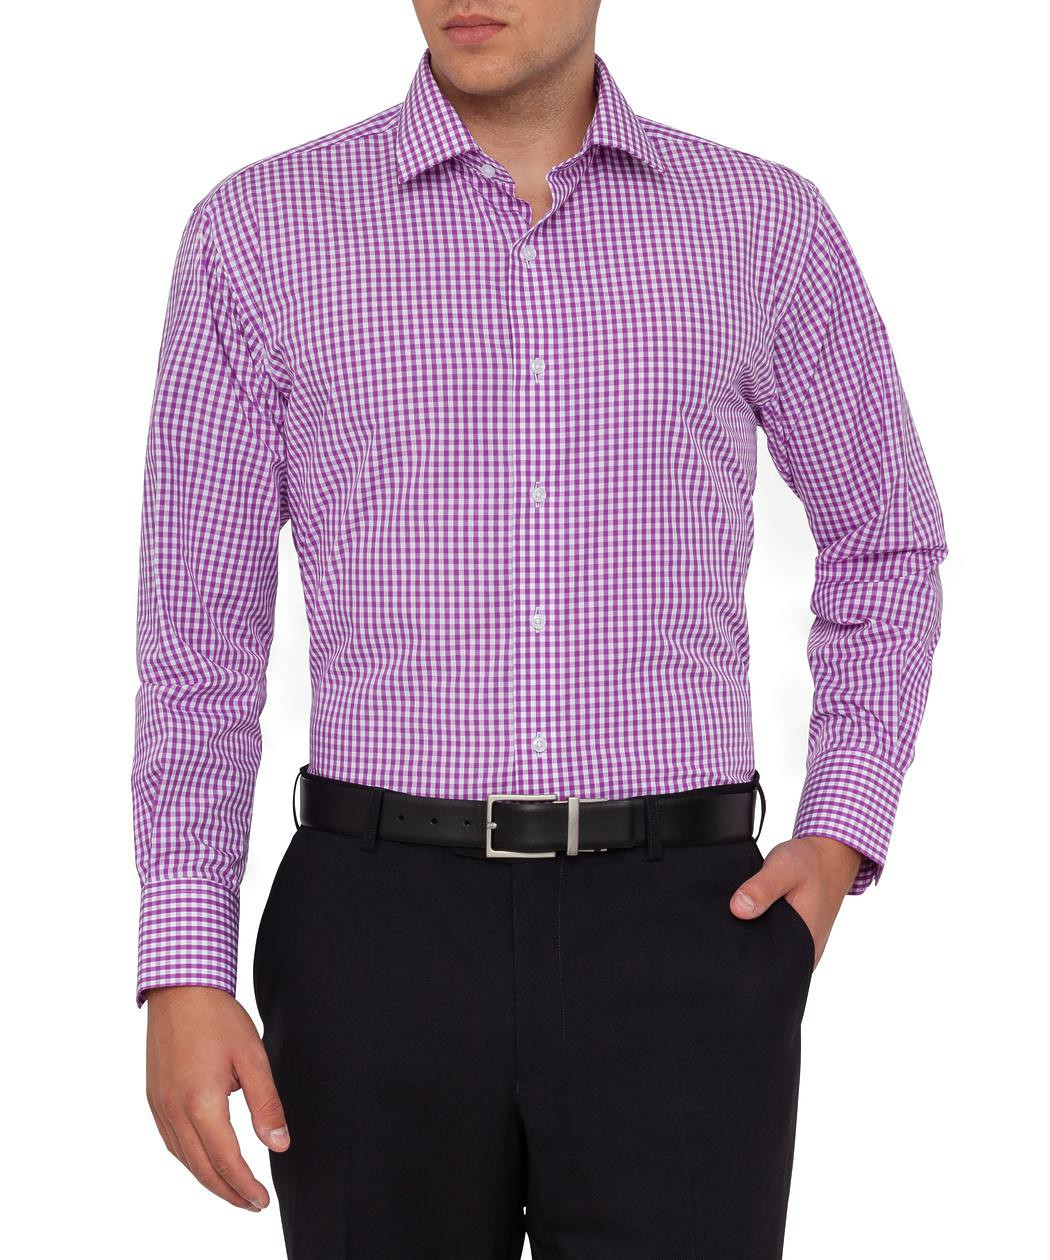 Van Heusen Mens Slim Fit Shirt Purple Check Mens Shirt